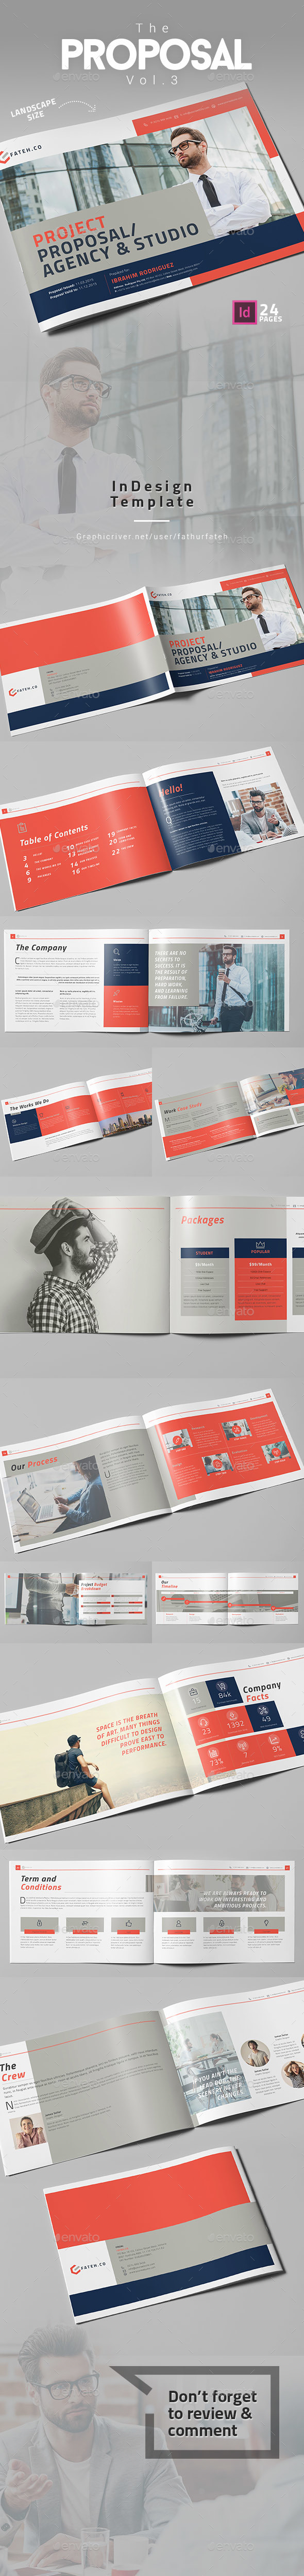 The Proposal Vol.3 - Landscape - Corporate Brochures